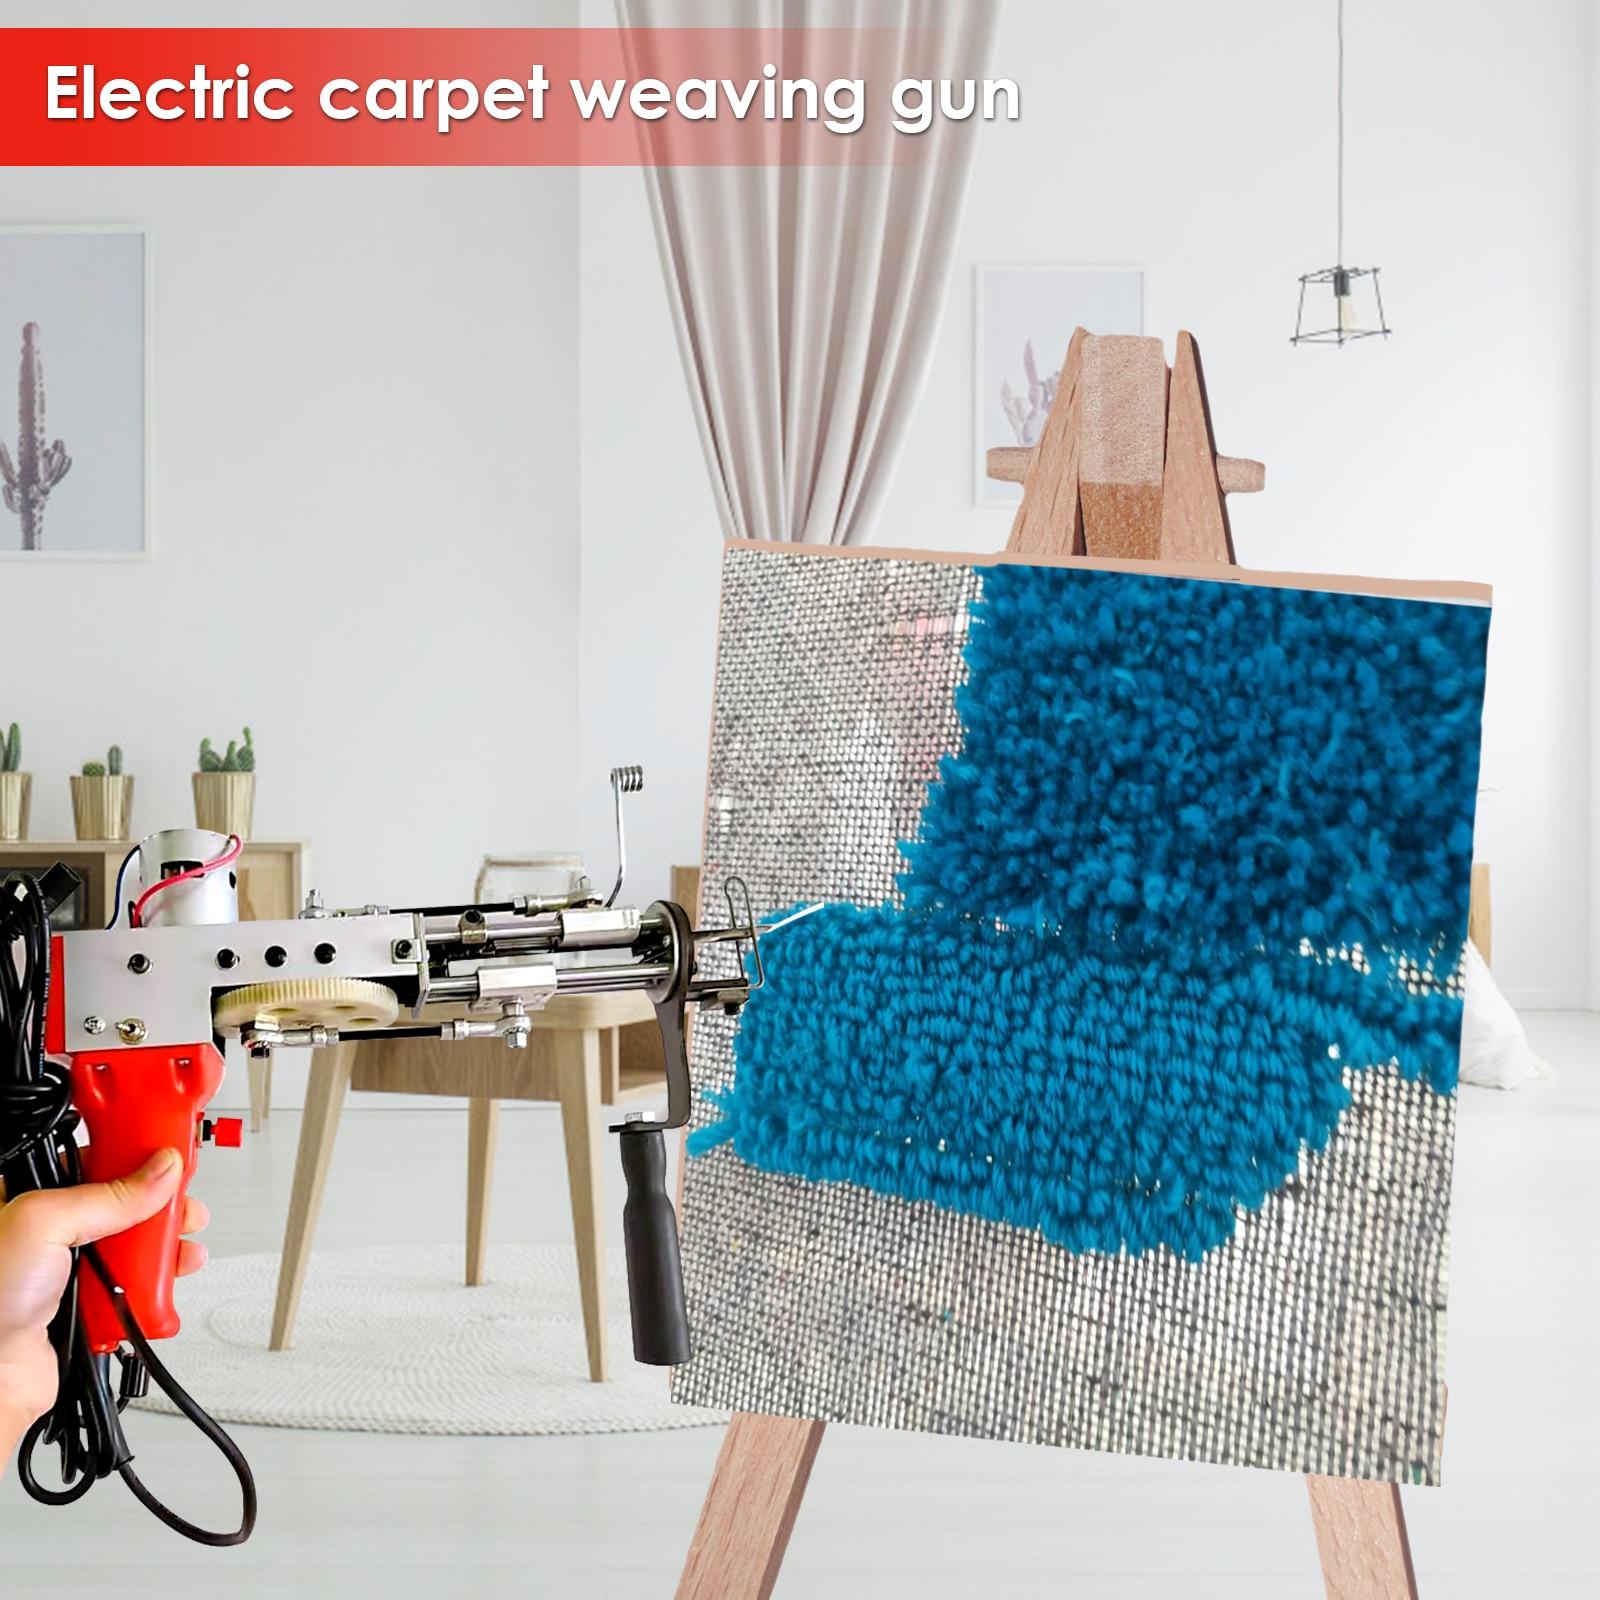 110V US Plug Electric Carpet Sewing Machine Upgraded Red Tufting Gun Rug Weaving Flocking Power Tool Cut Pile Handheld Euipment enlarge